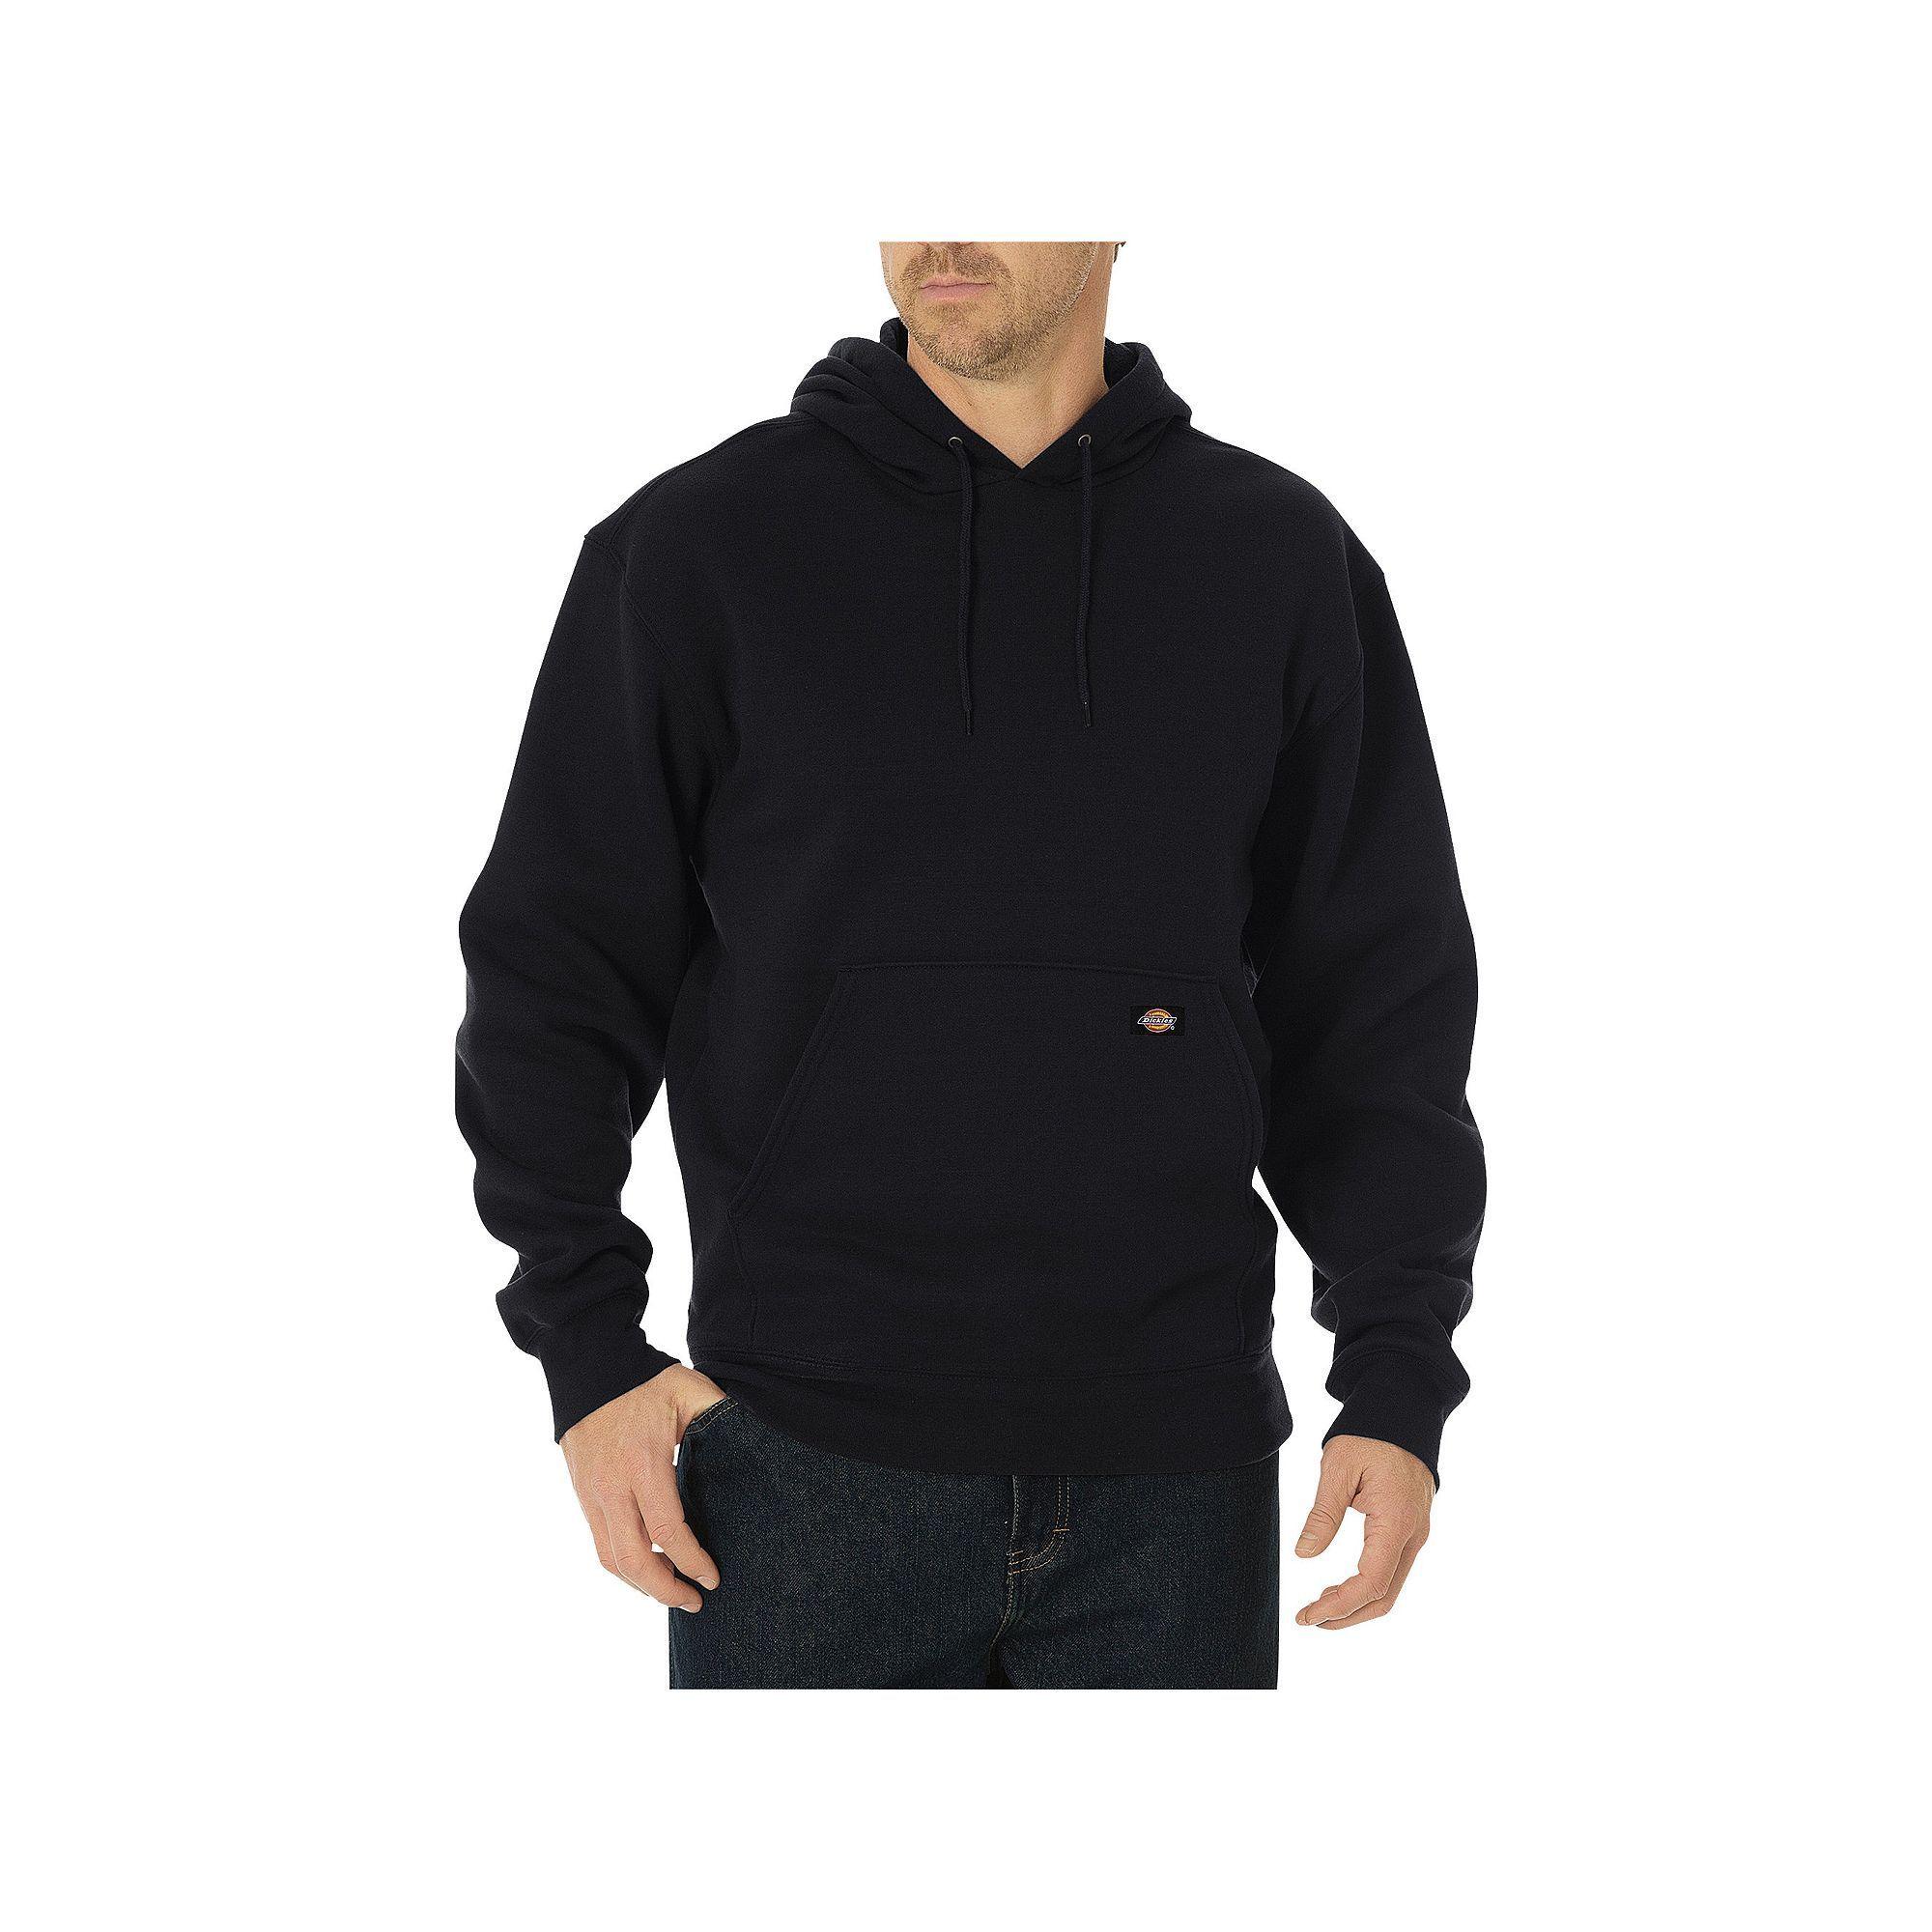 9163057d12 Men's Dickies Midweight Fleece Pullover Hoodie, Size: X Lrge M/R, Black